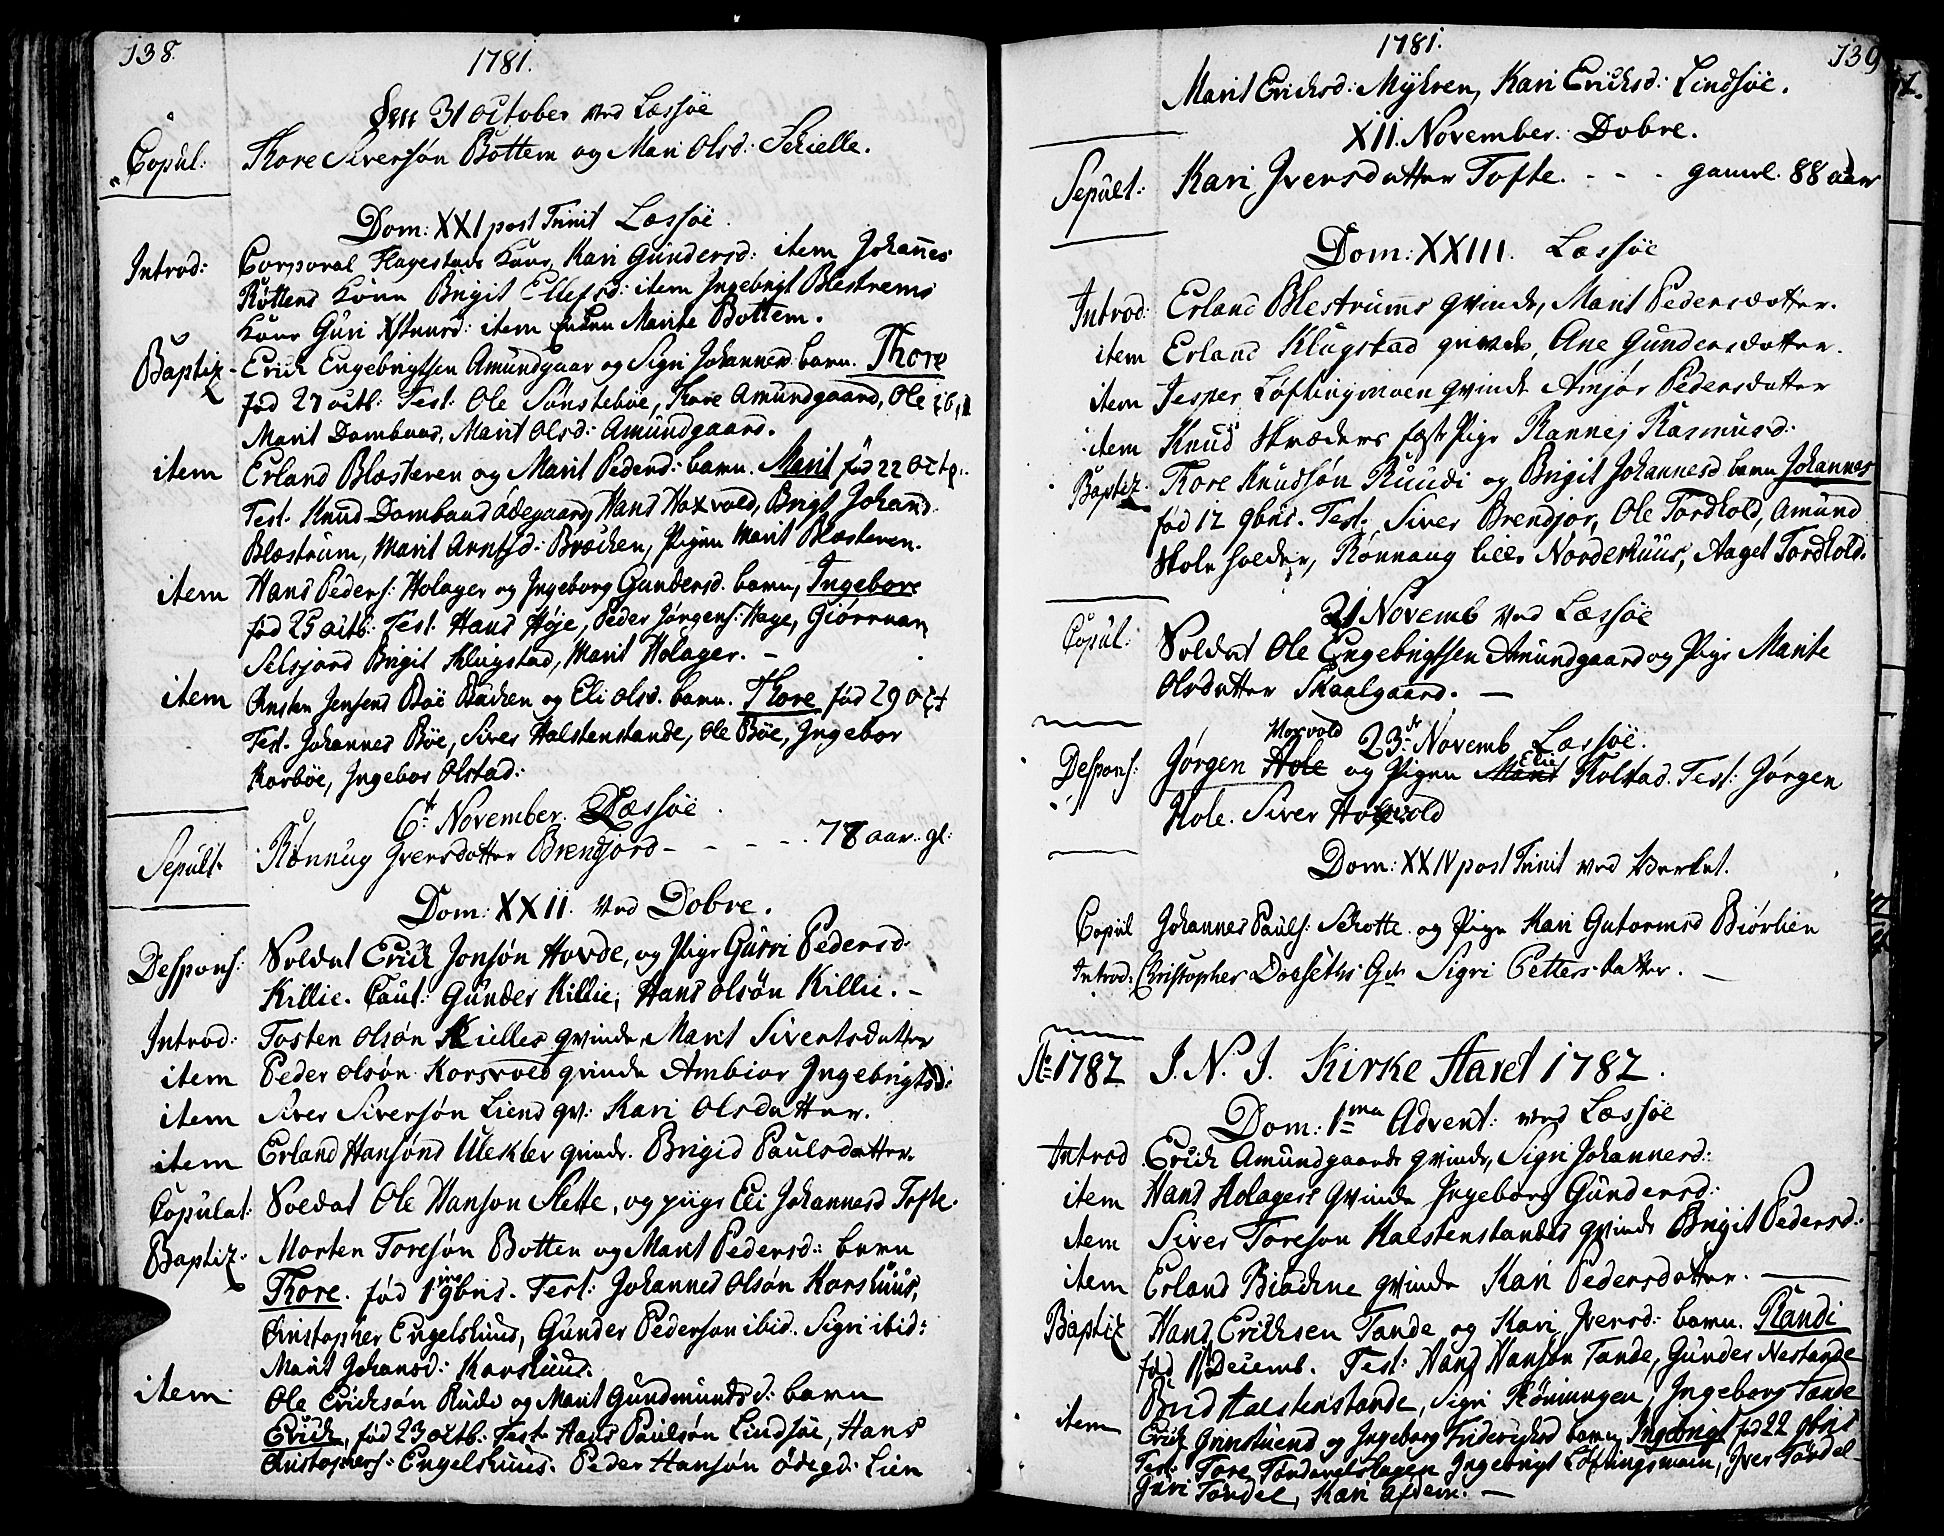 SAH, Lesja prestekontor, Ministerialbok nr. 3, 1777-1819, s. 138-139